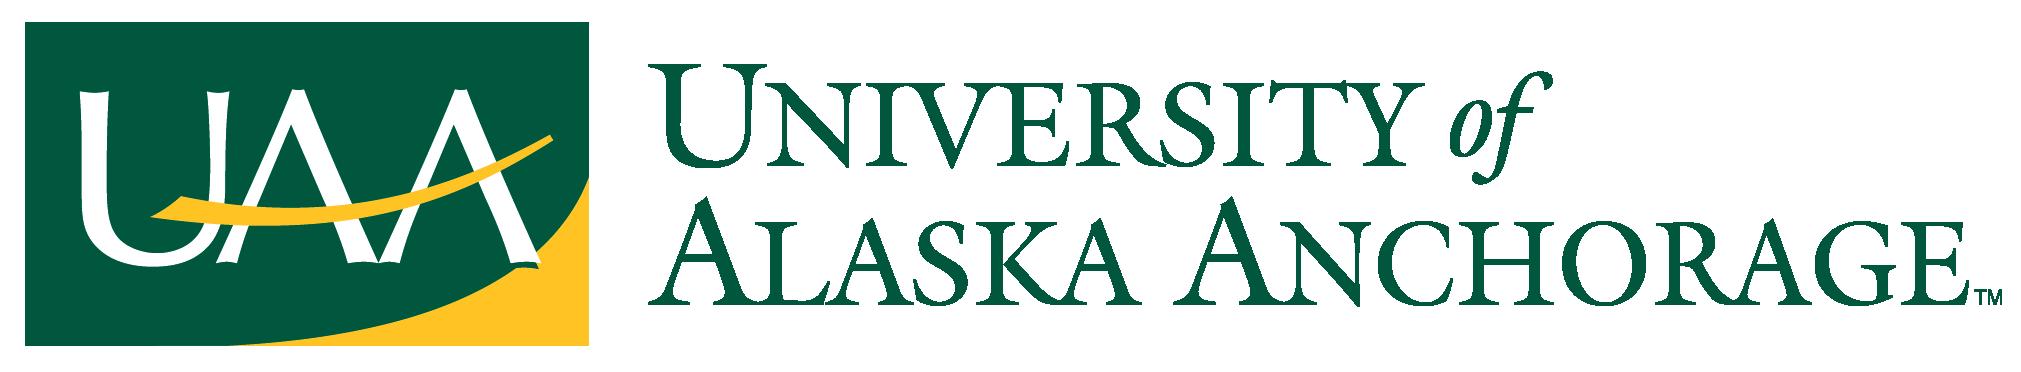 UAA Donation Page